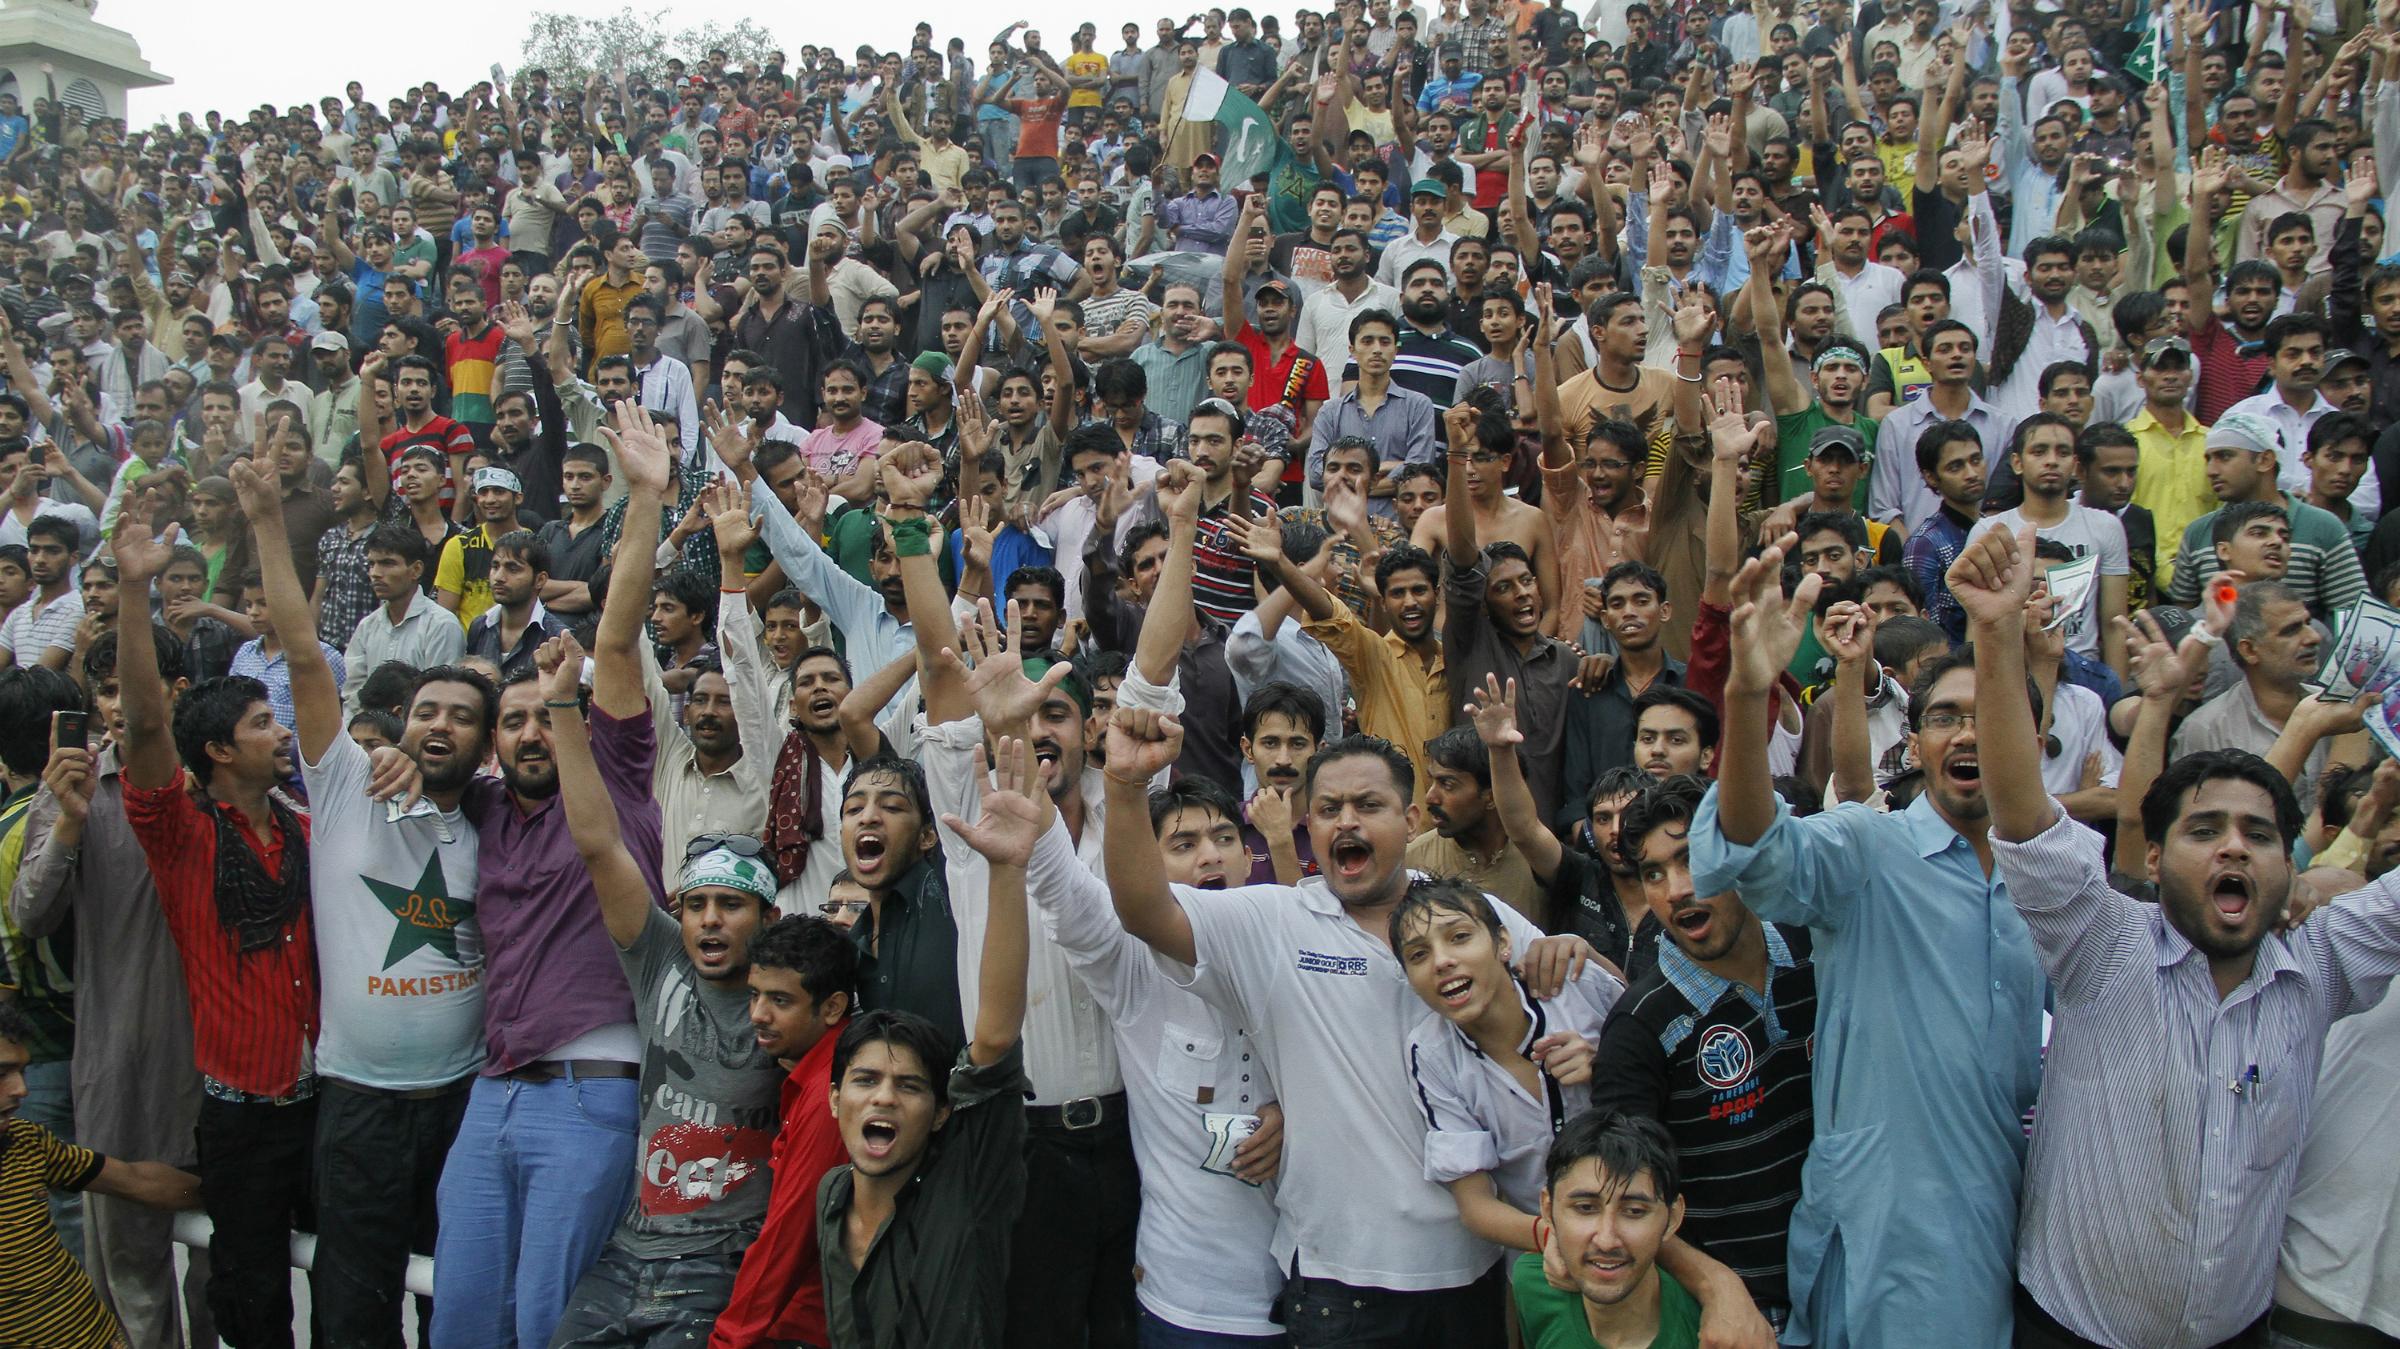 PakistanIndependence